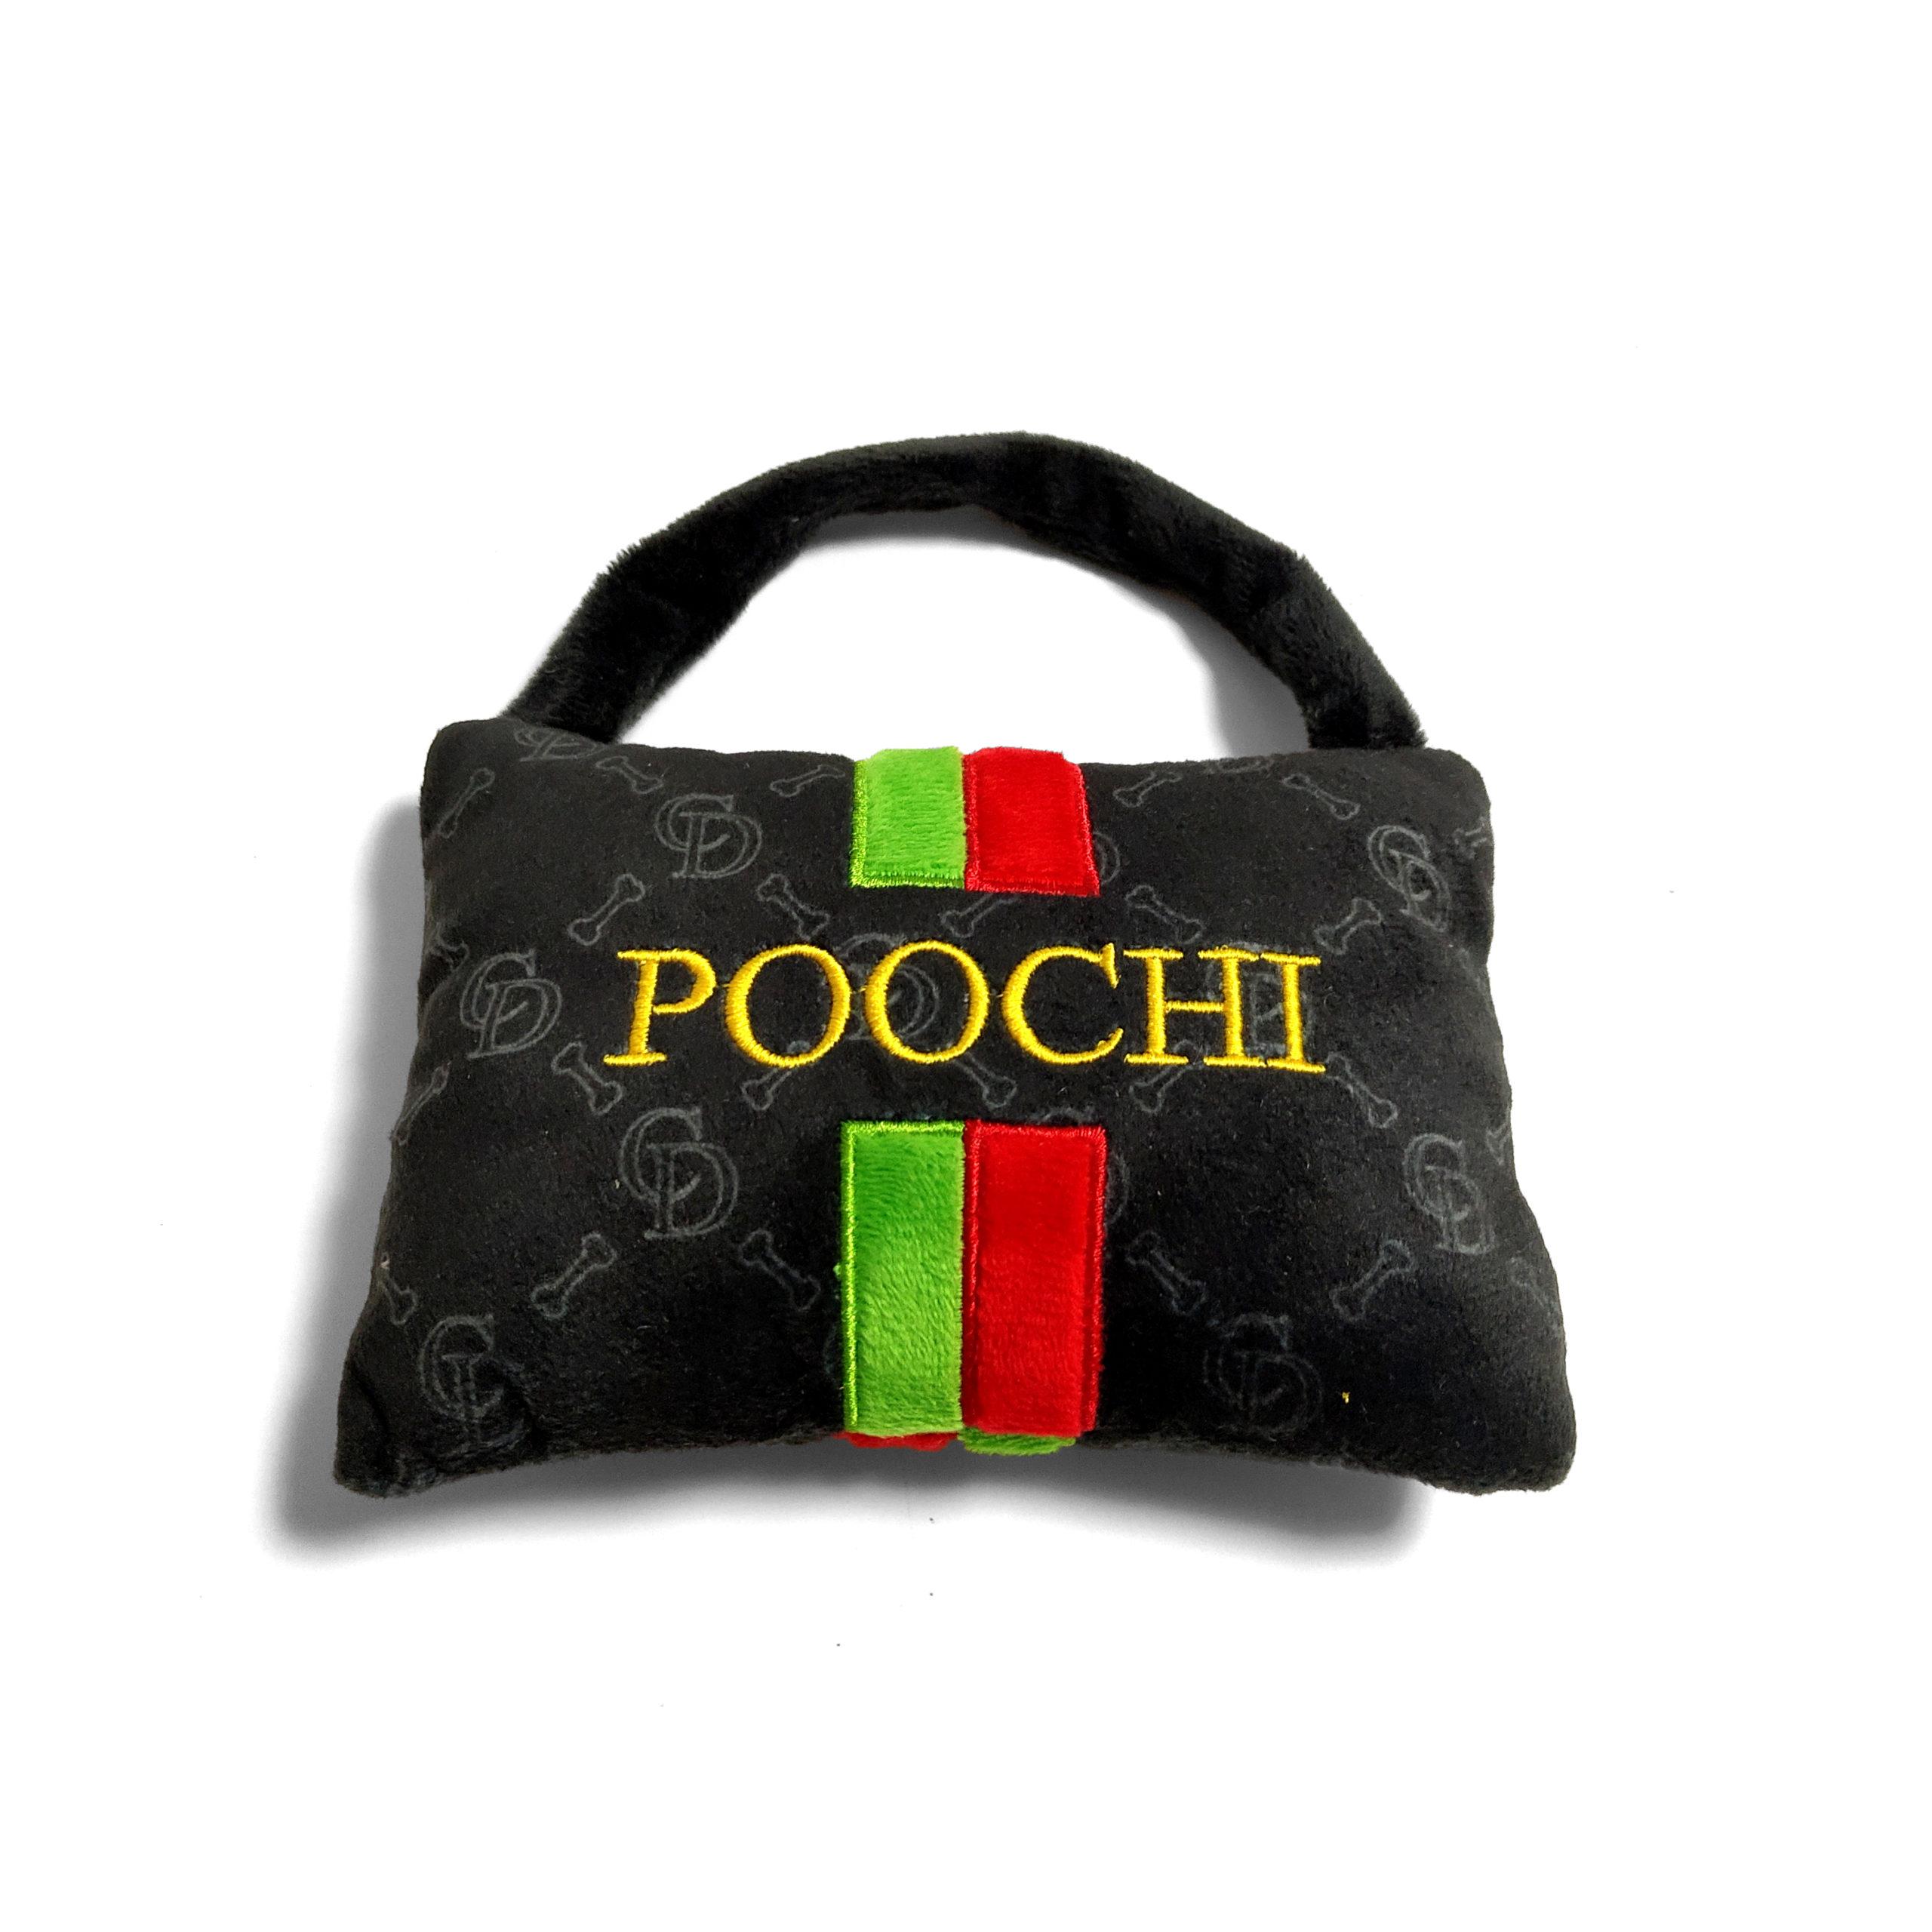 CatwalkDog Poochi Handbag Parody Plush Dog Toy